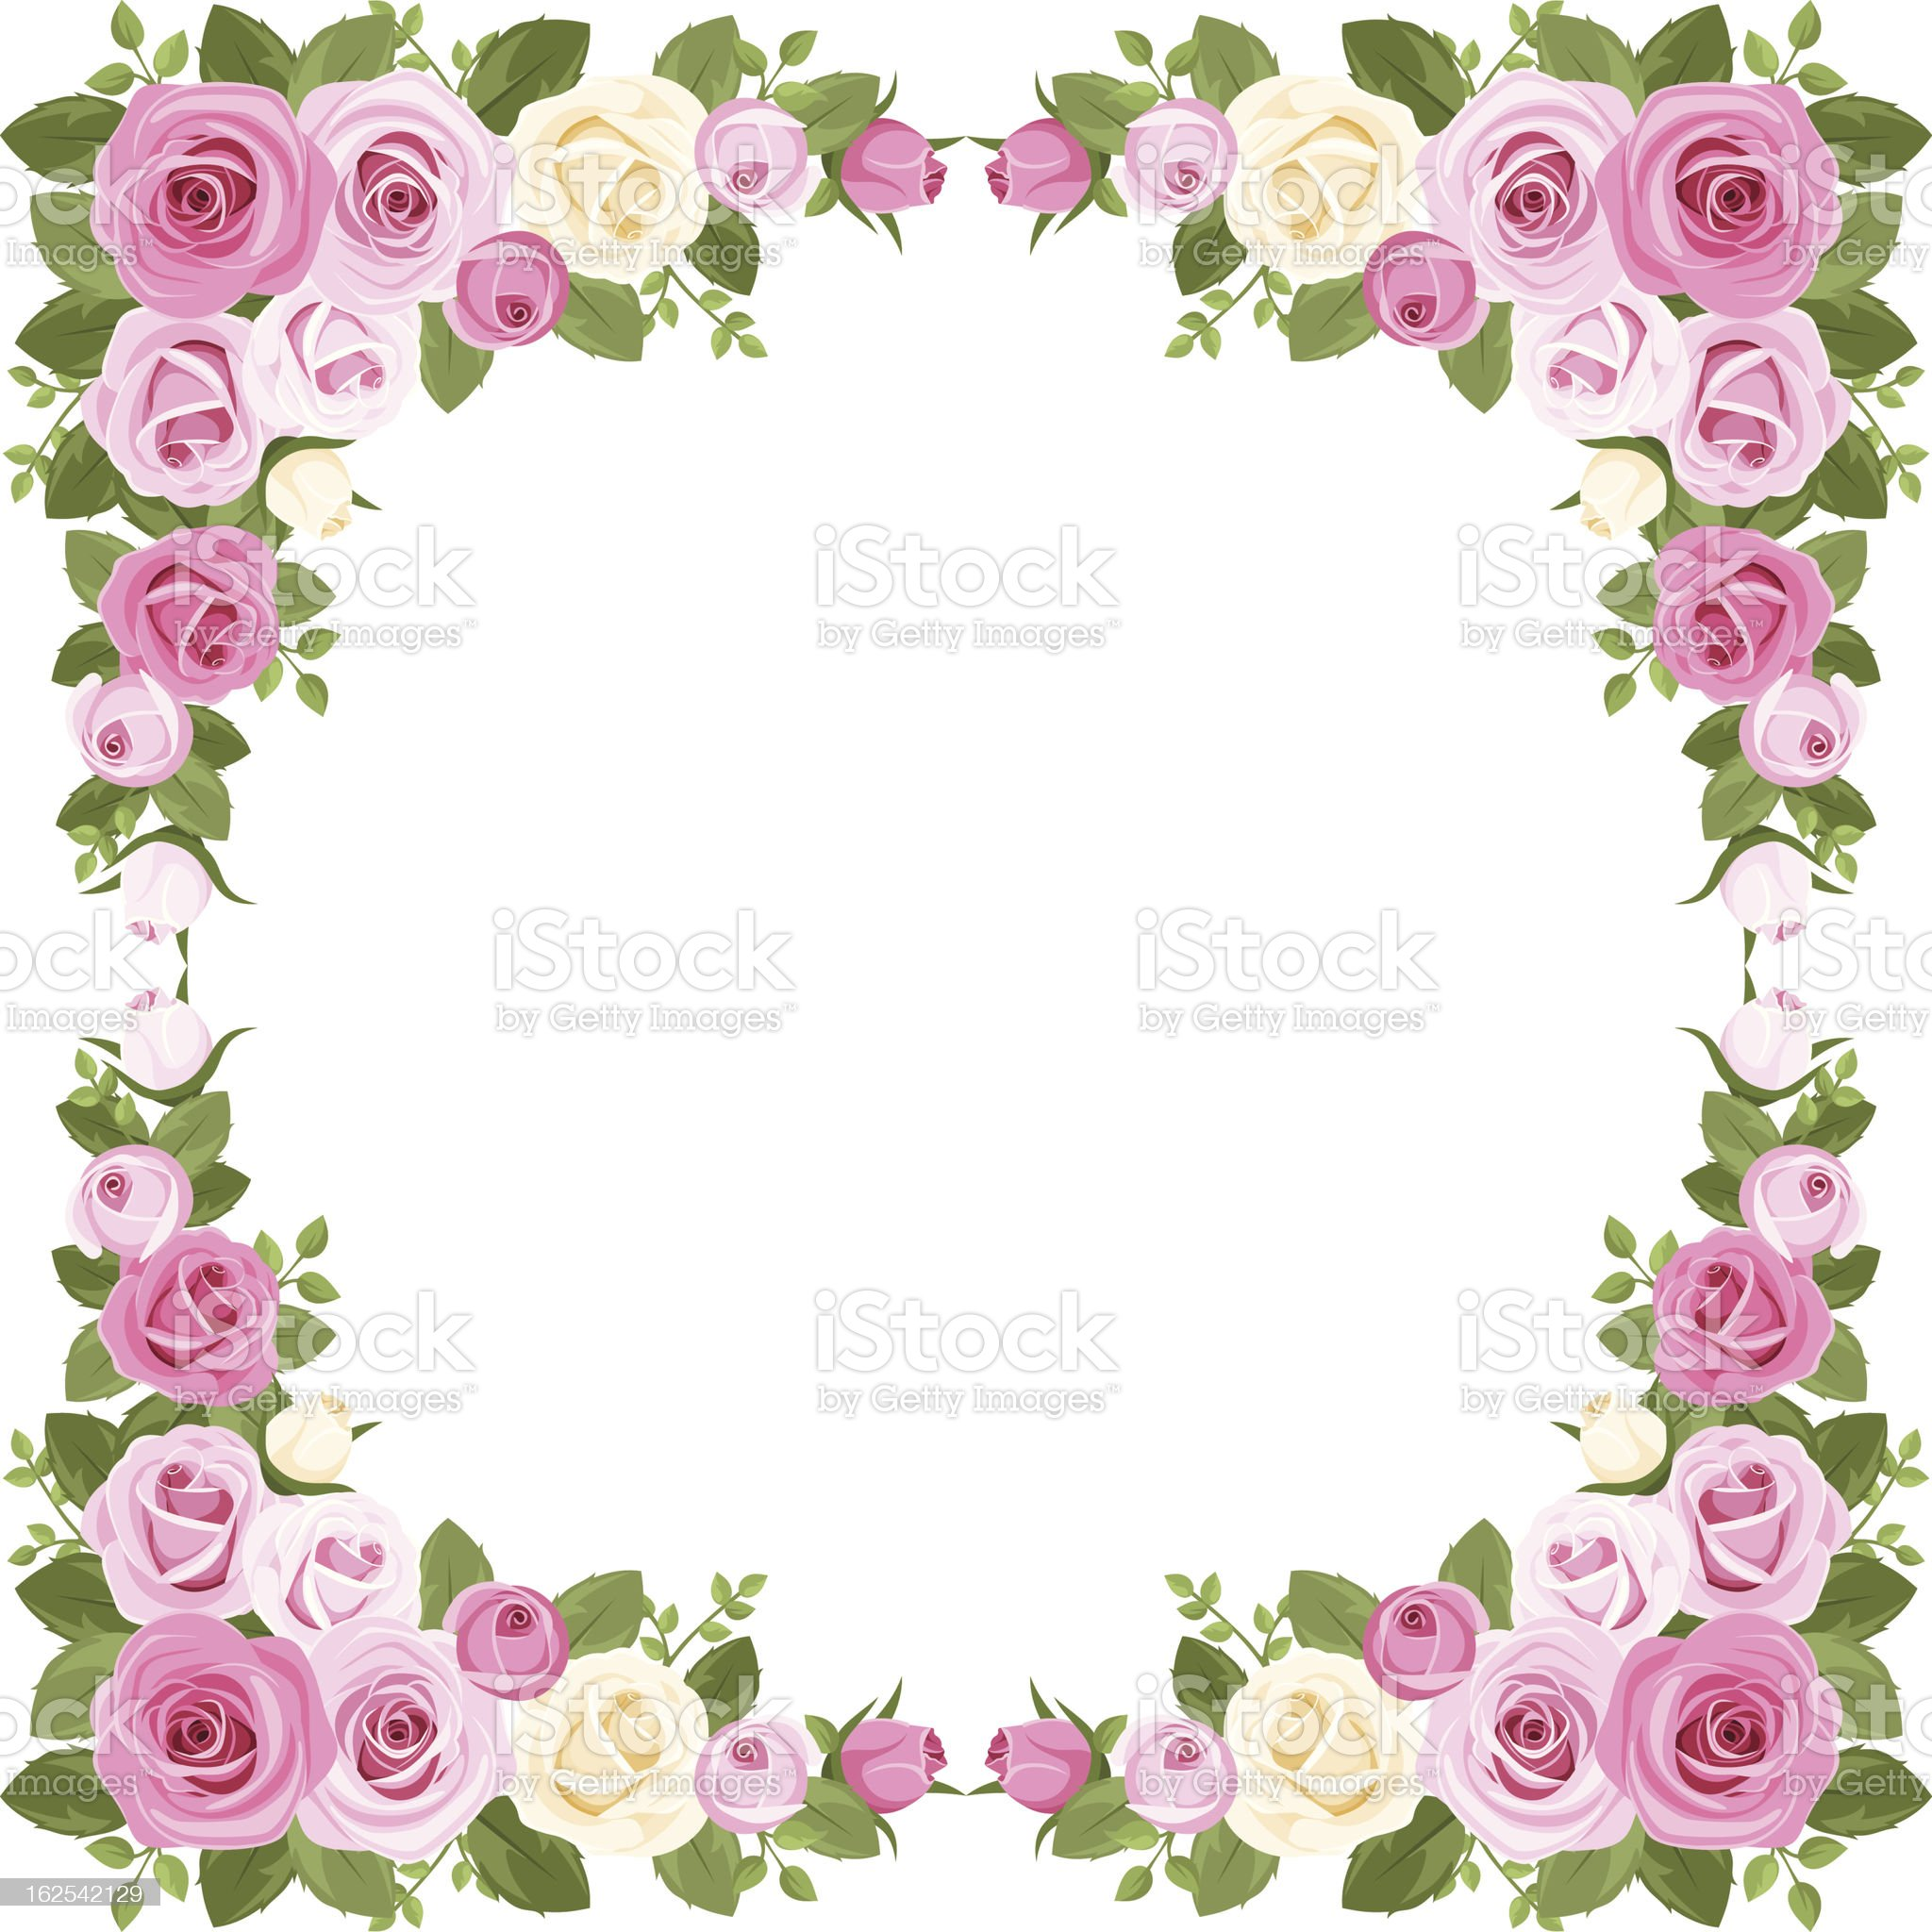 Vintage roses frame. Vector illustration. royalty-free stock vector art